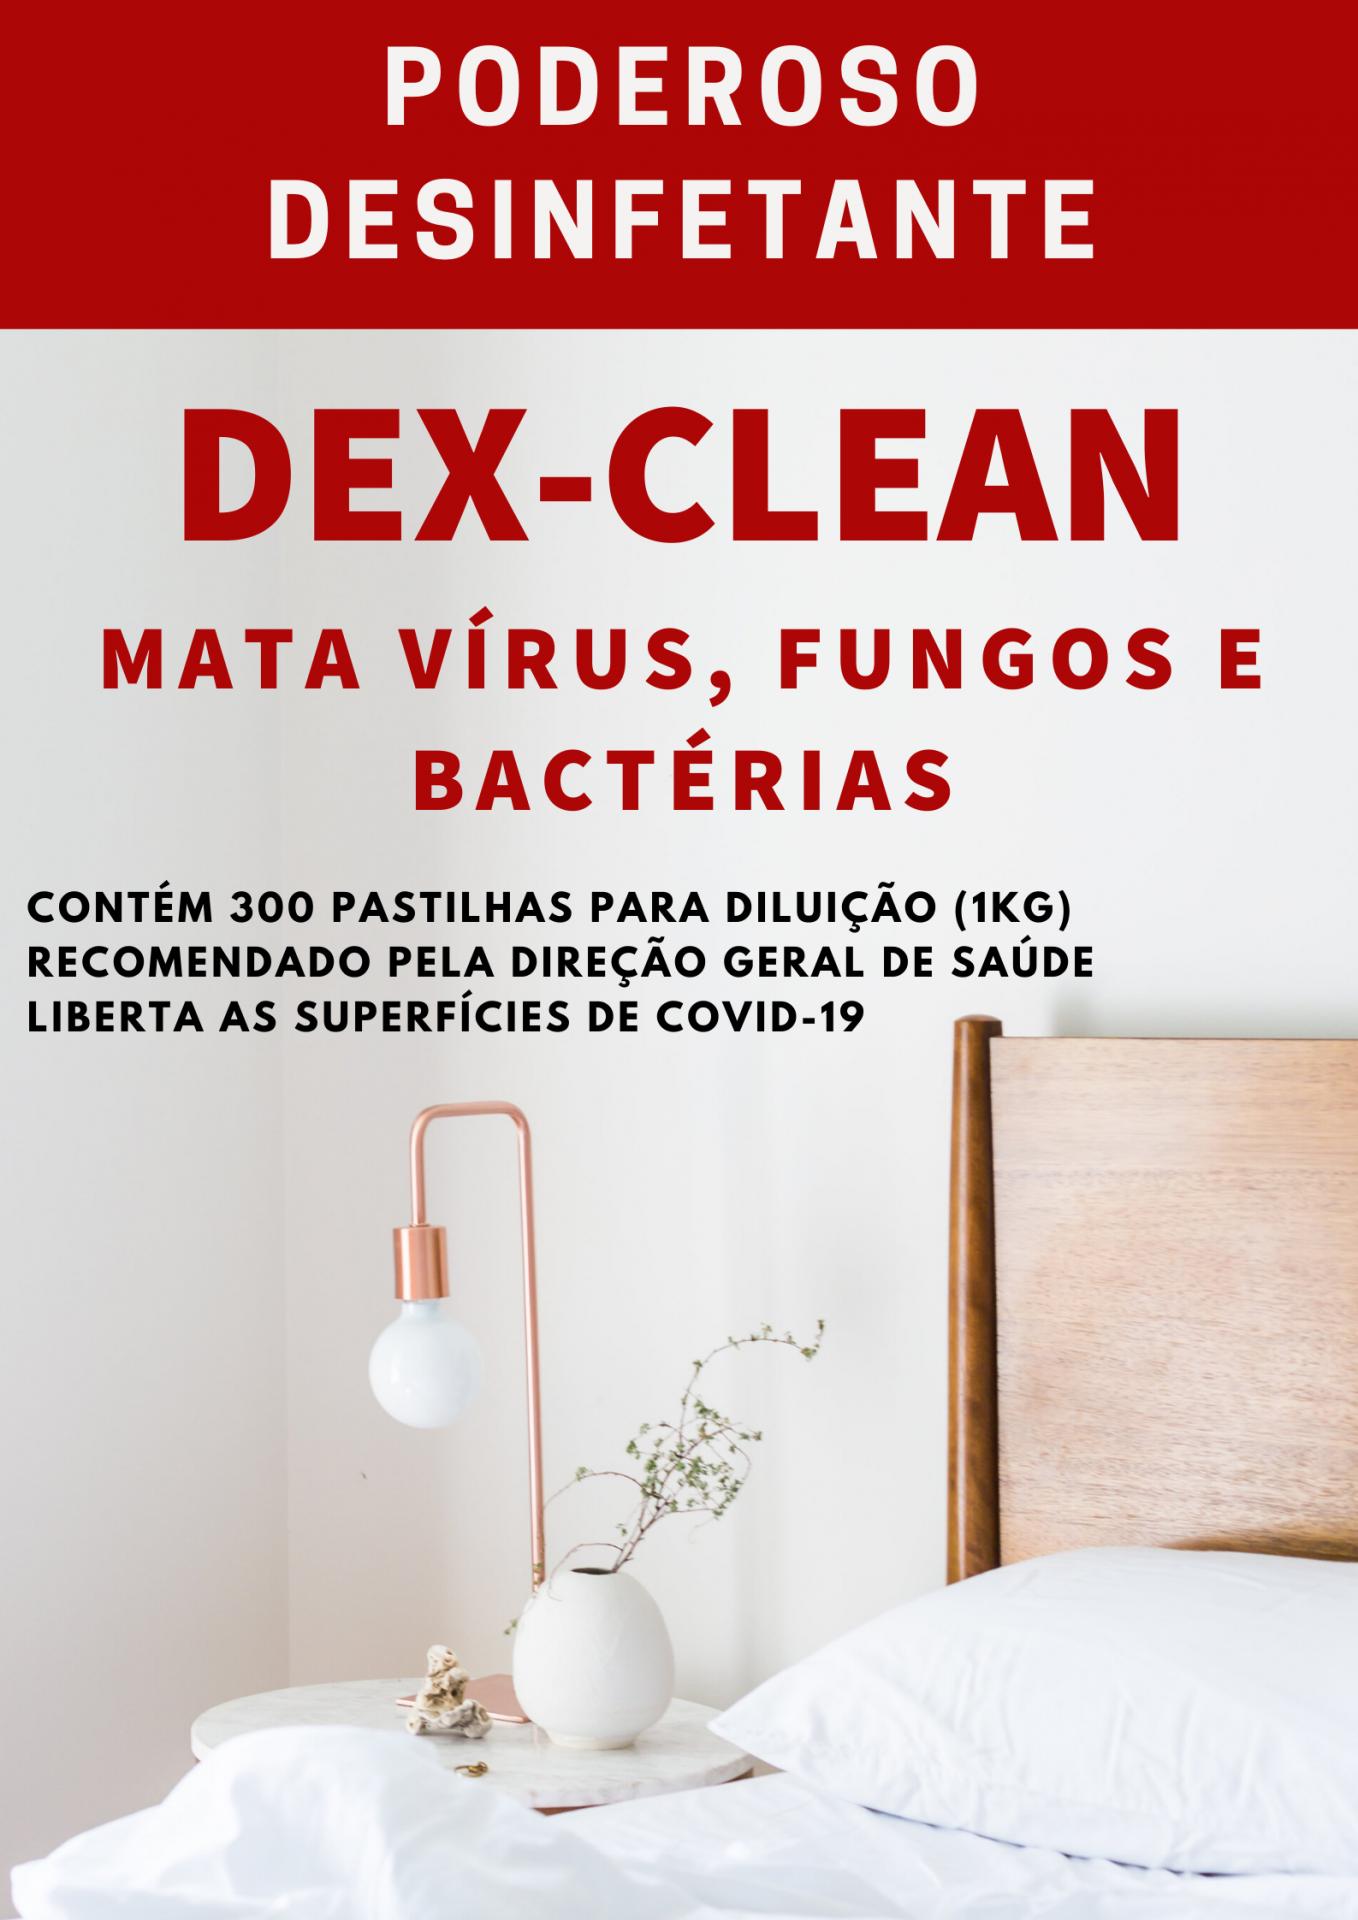 DEX CLEAN Desinfetante de virus (covid19), bactérias, fungos,  recomendado pela DGSaúde. 1 kg = 300 pastilhas